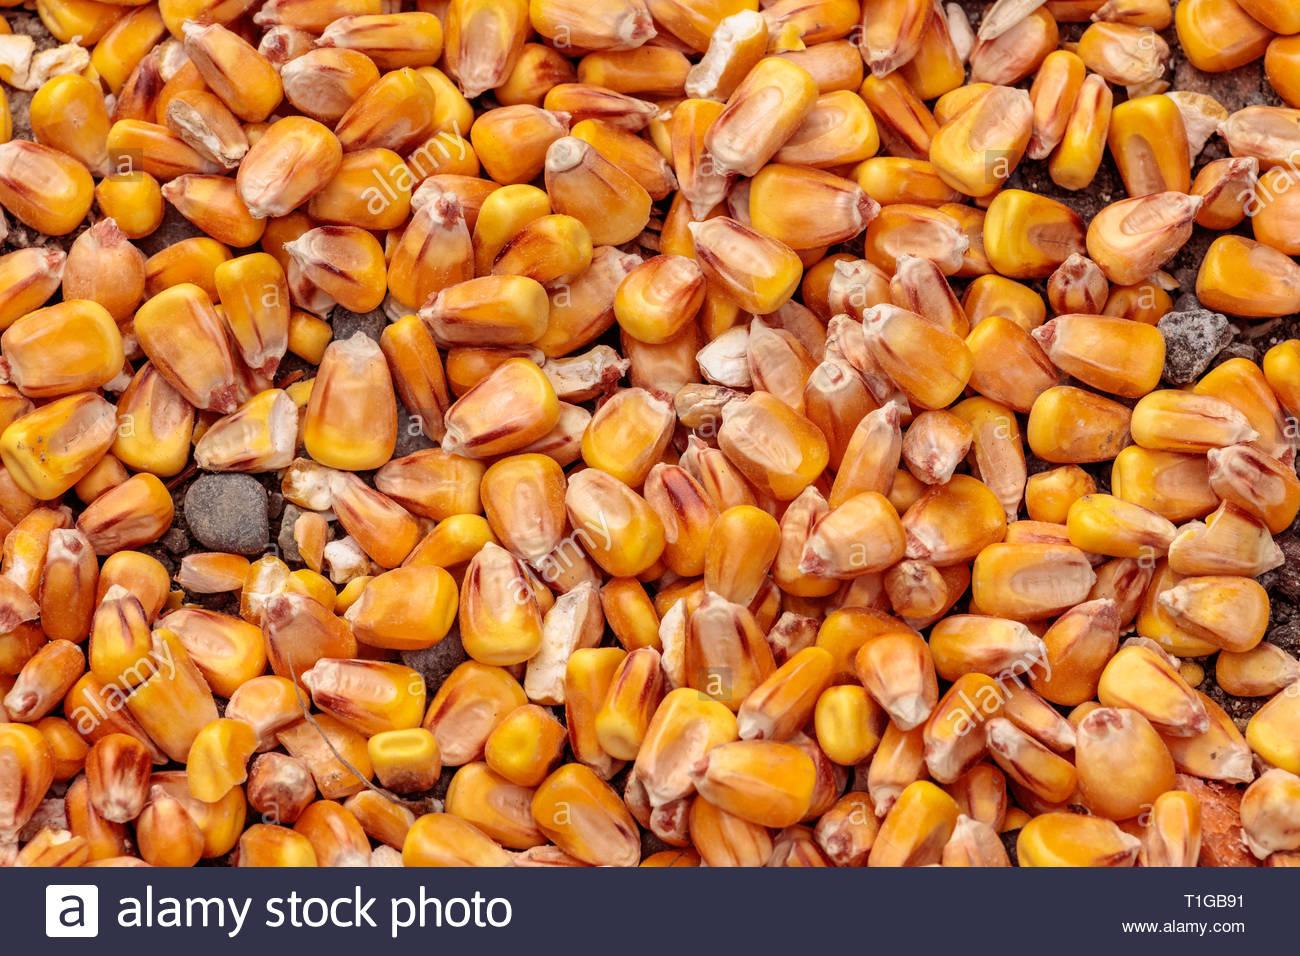 Maize or corn kernels close up yellow pattern - Stock Image